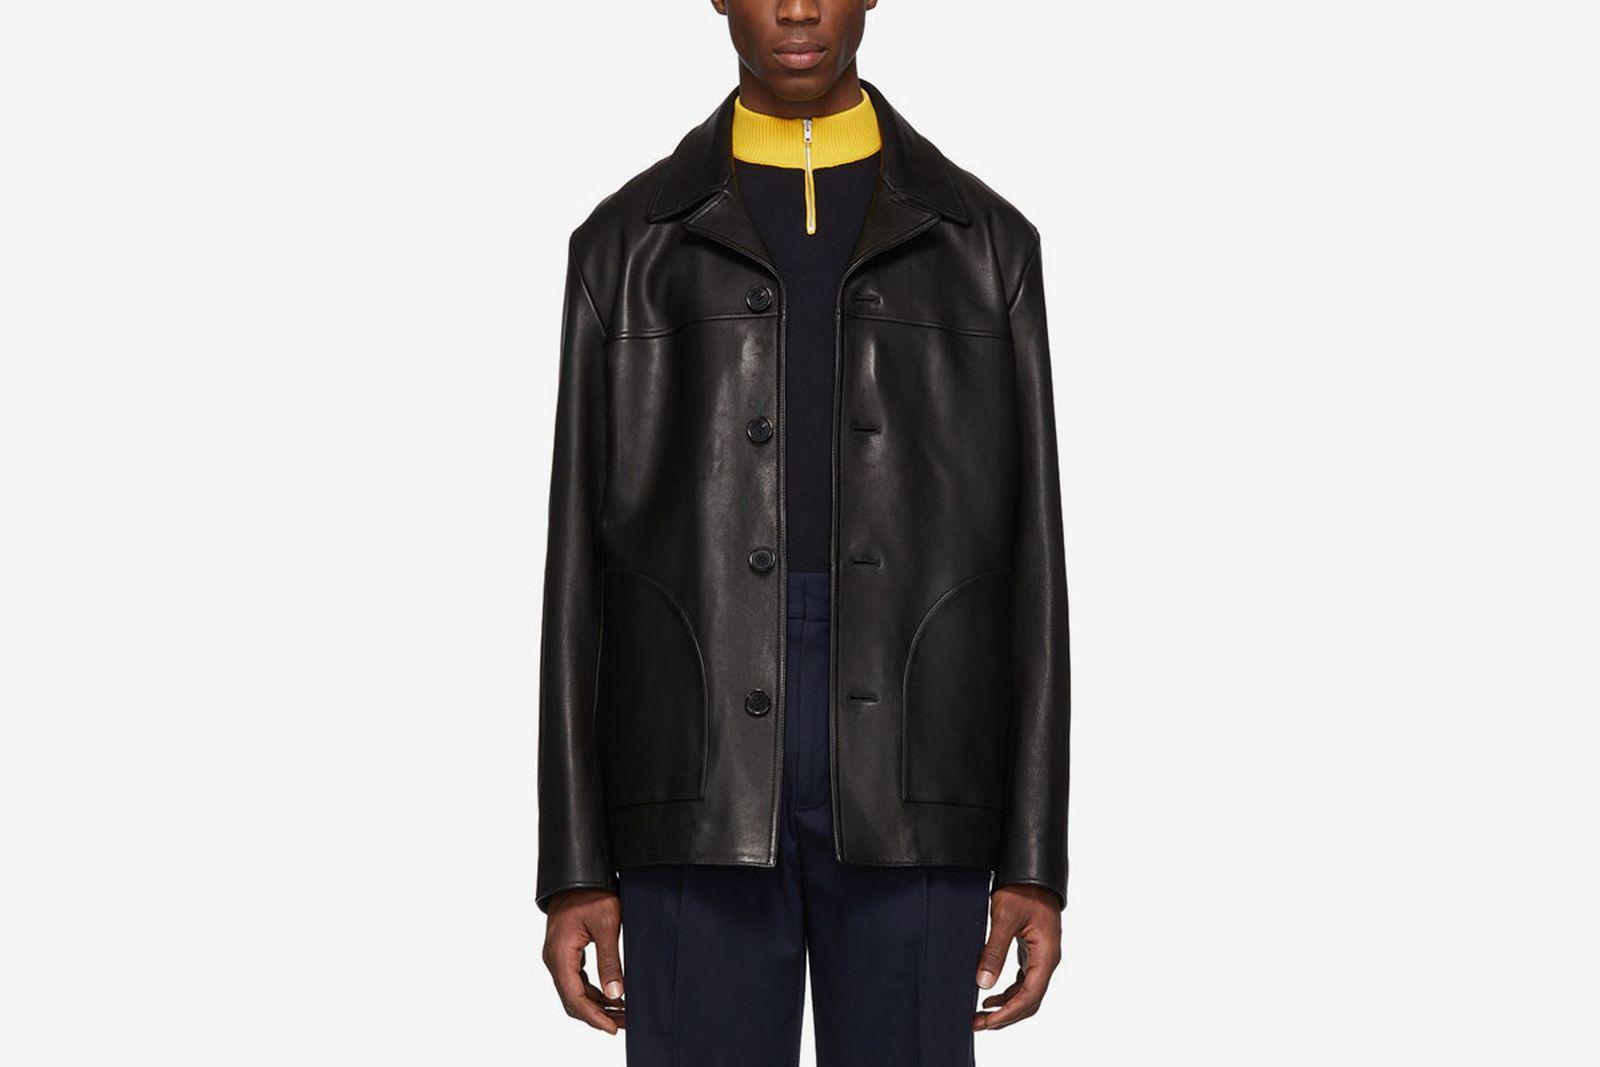 leather jackets main Acne Studios OFF-WHITE c/o Virgil Abloh Zara